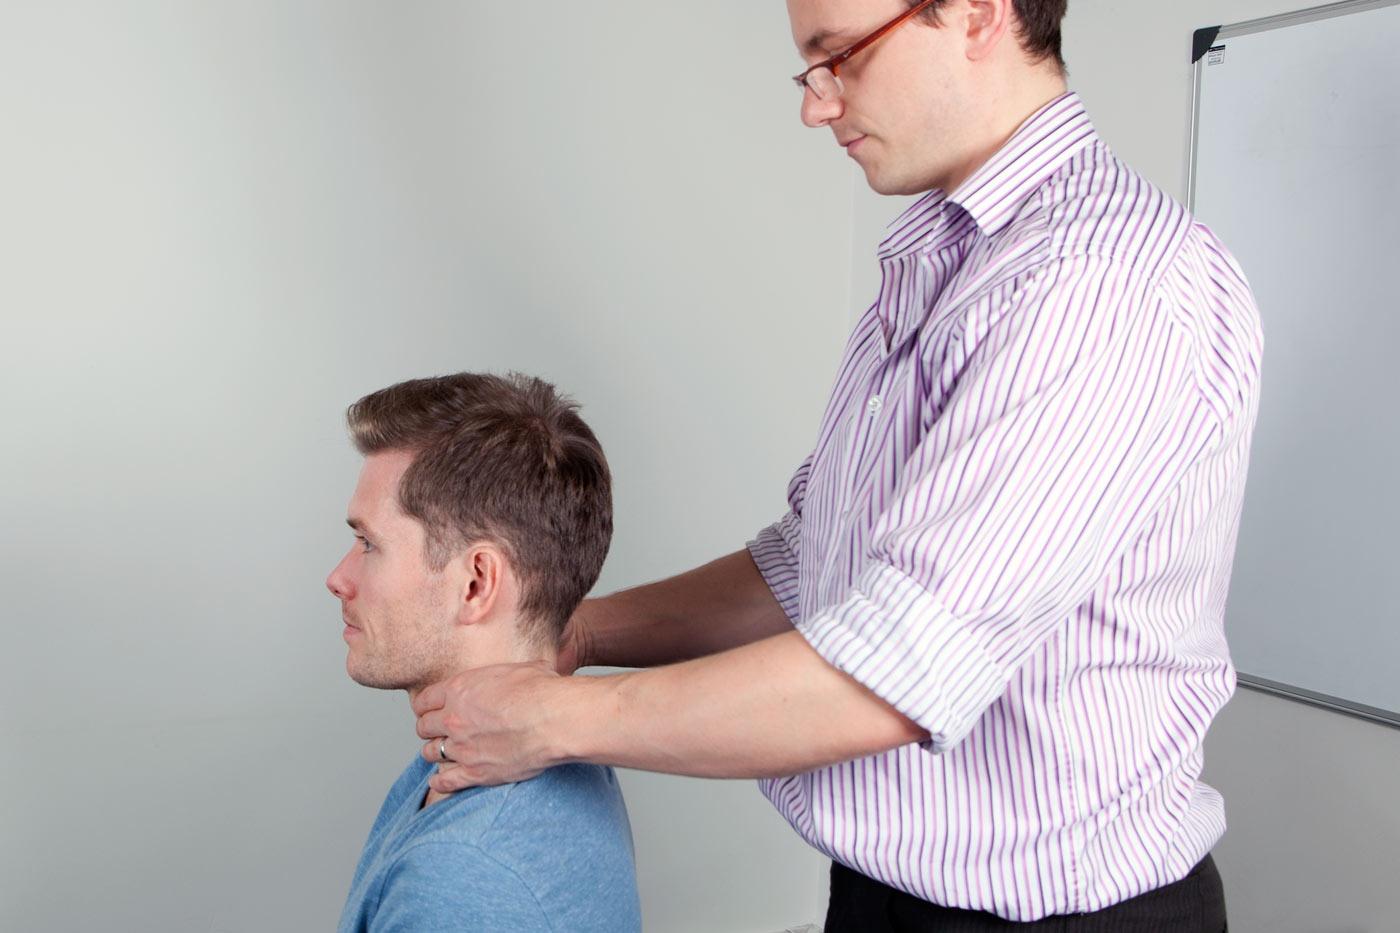 Palpate the thyroid gland